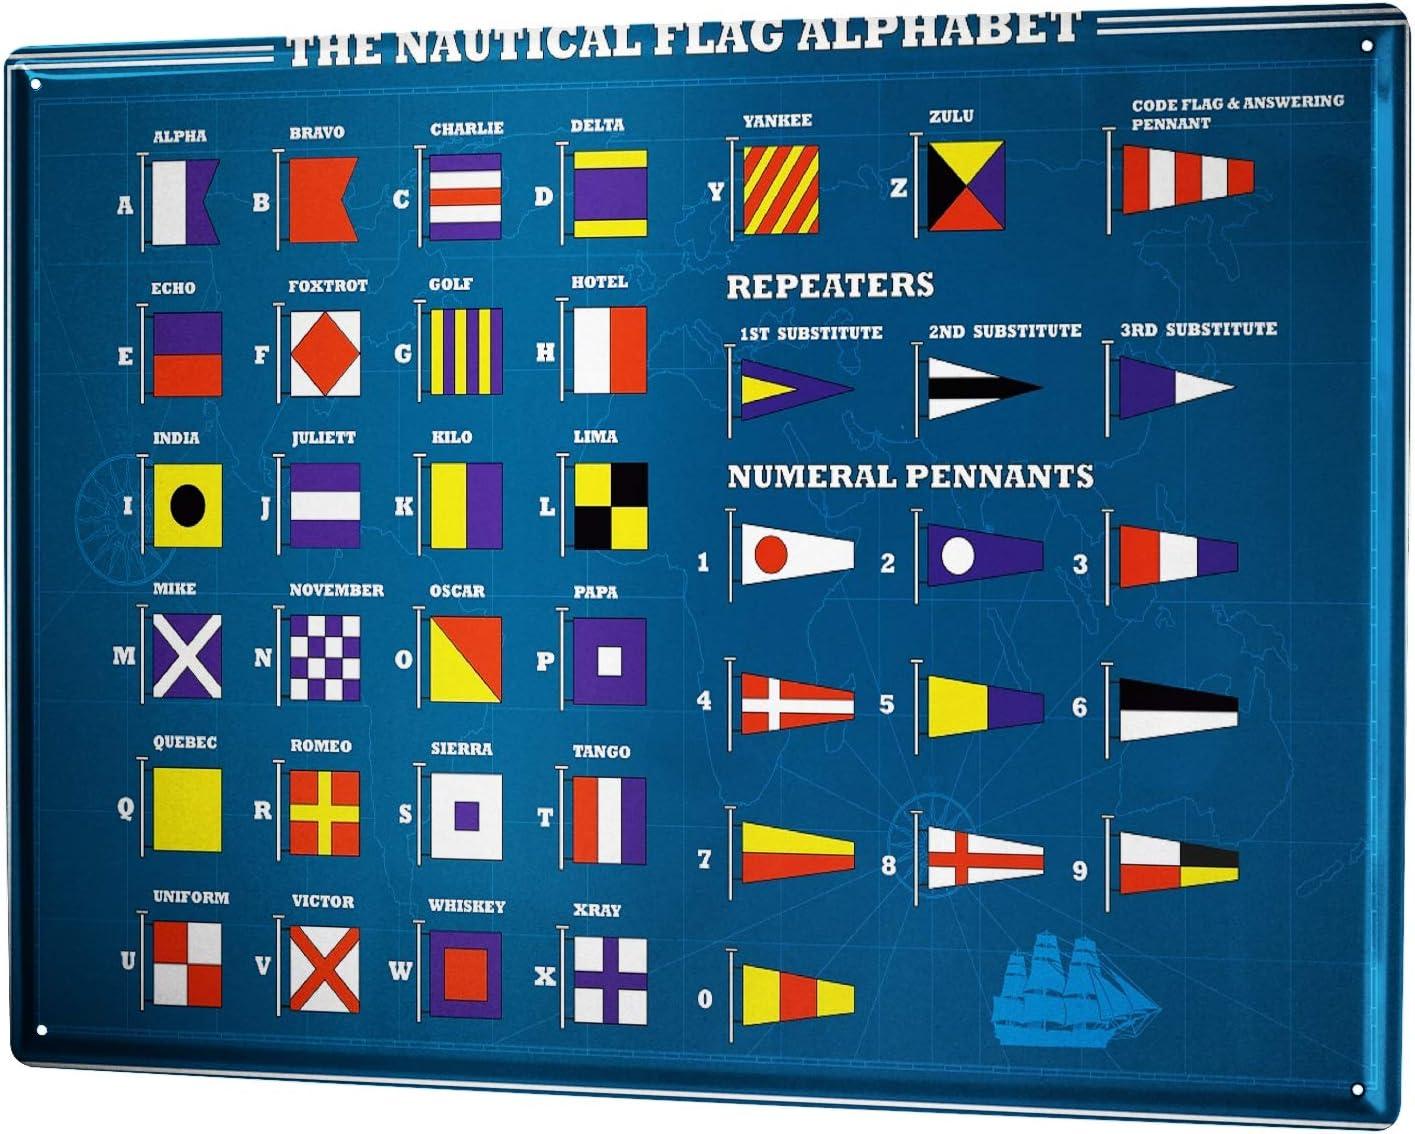 LEotiE SINCE 2004 Tin Sign Metal Plate Decorative Sign Home Decor Plaques 30 x 40 cm Metal Plate Plaque Globetrotter Nautical Flags Alphabet